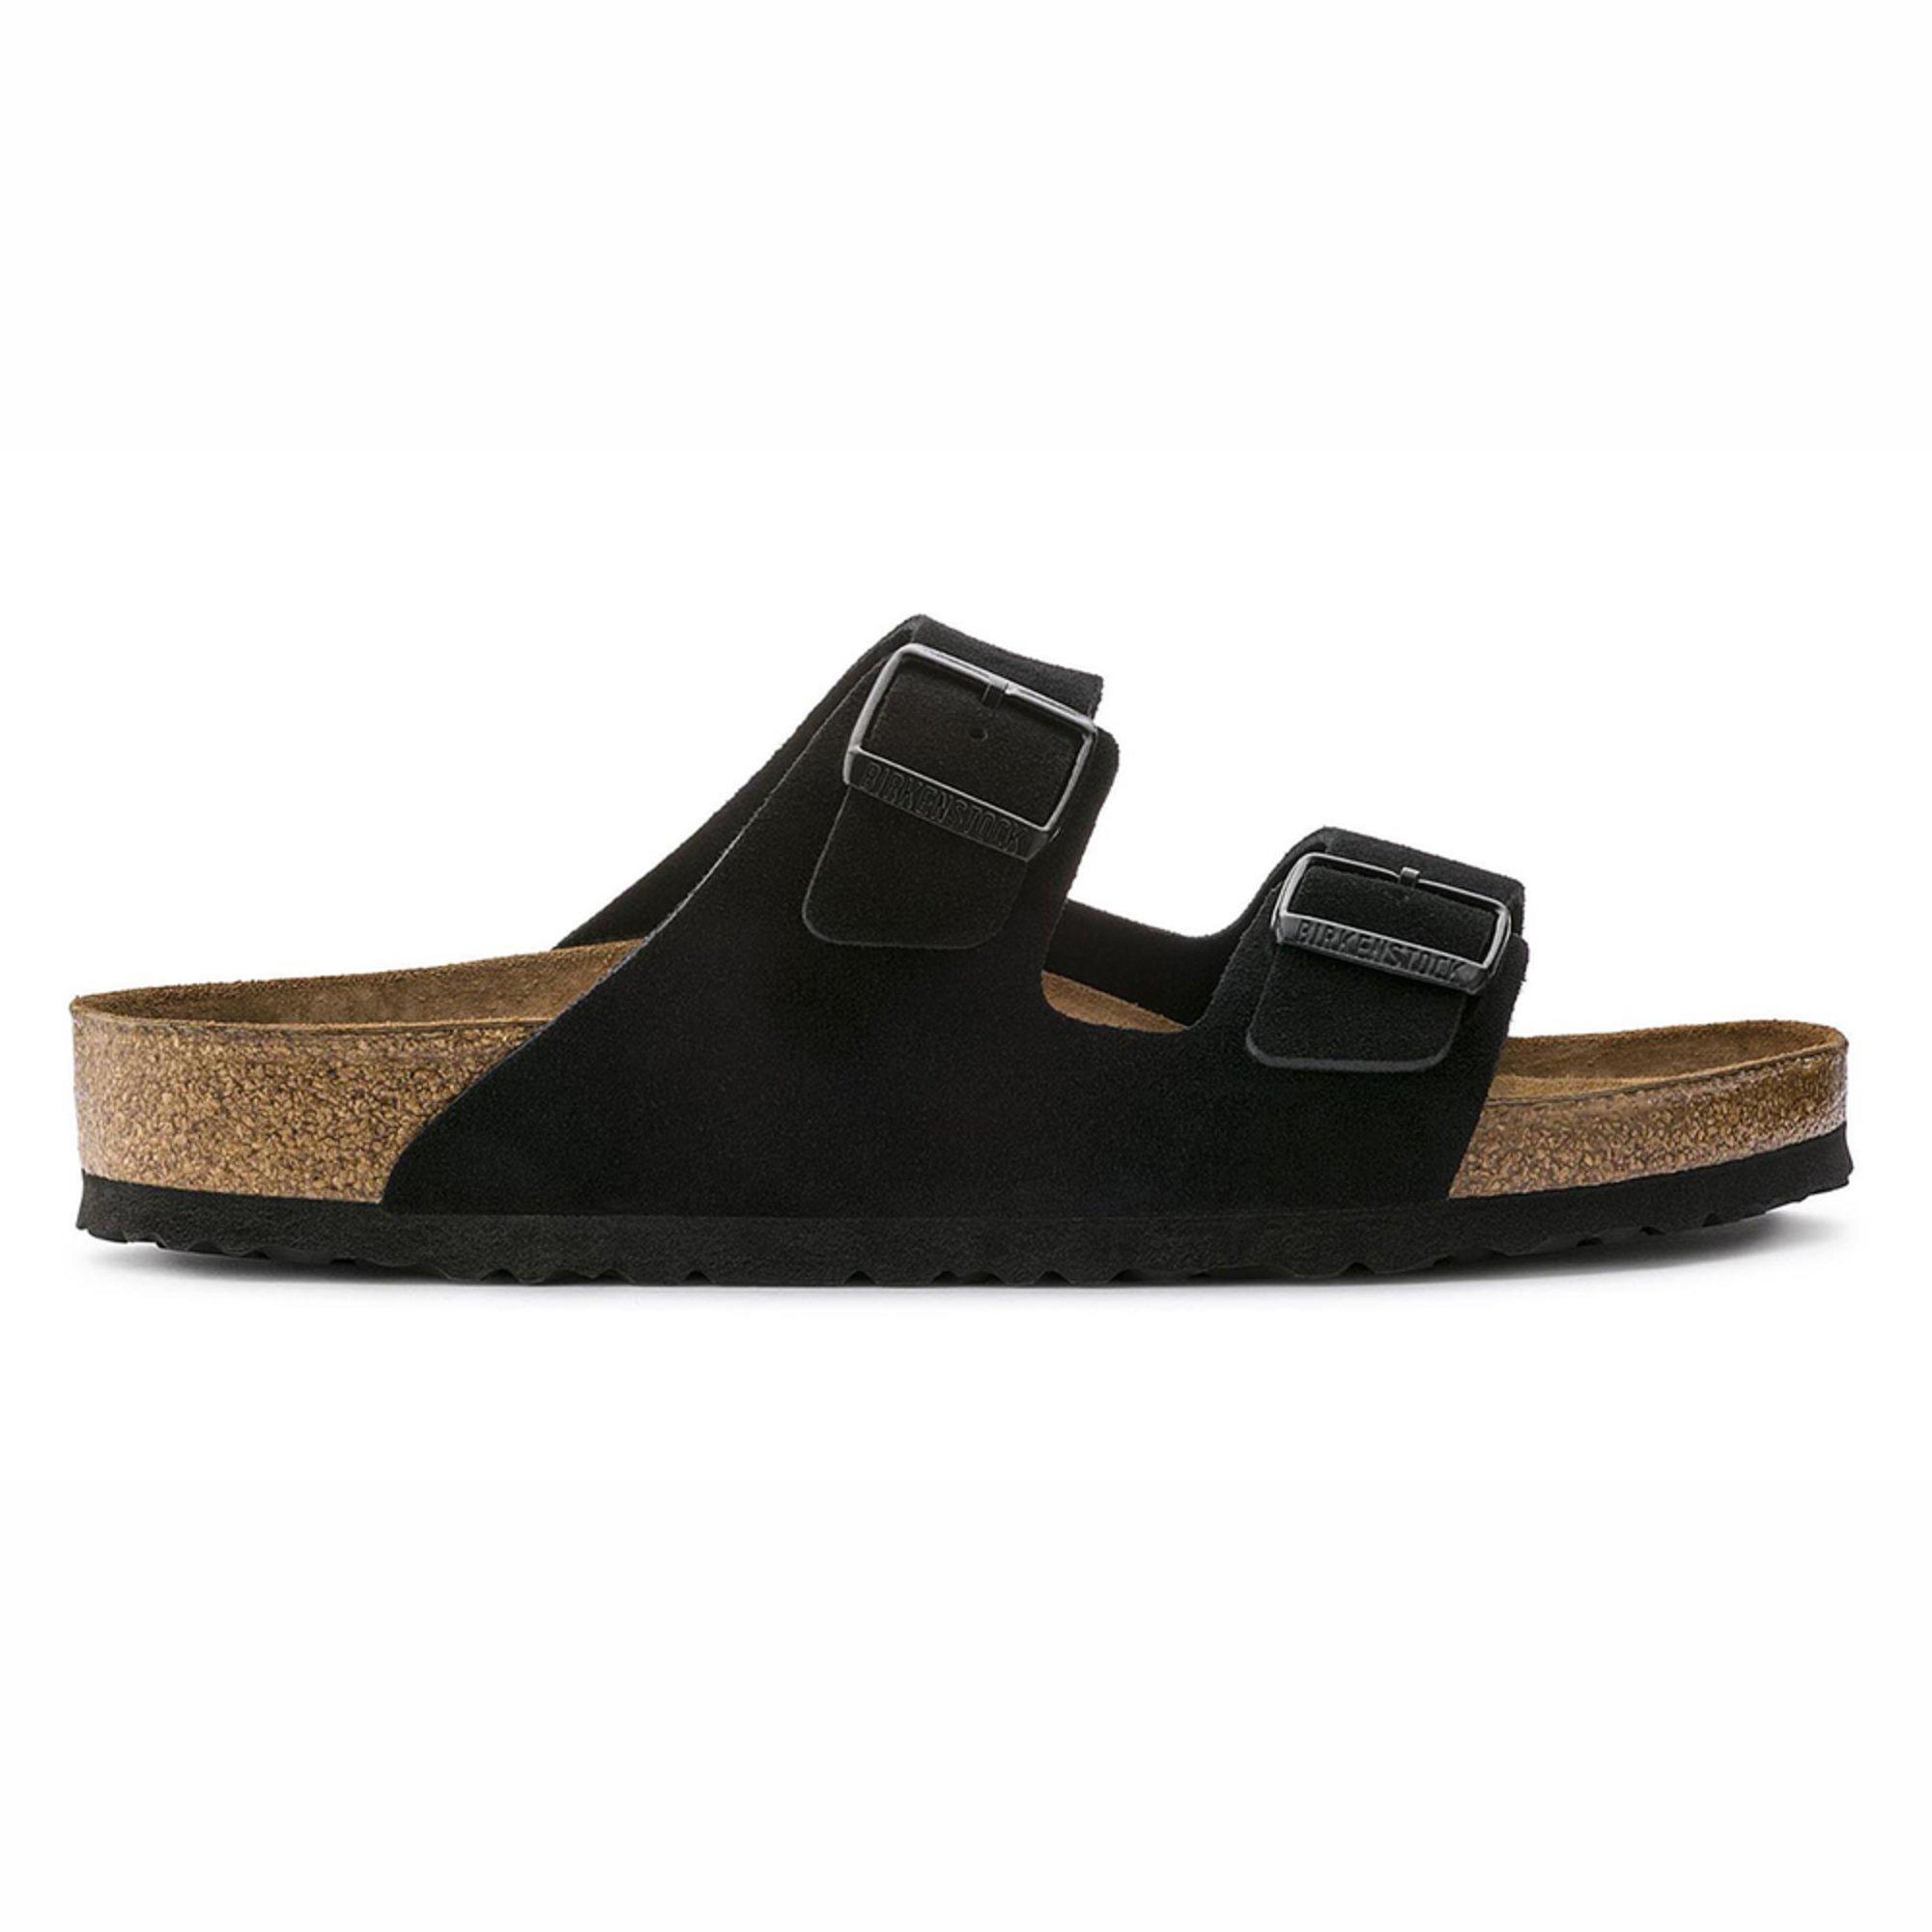 81c8f3a1d Birkenstock Women's Arizona Suede Sandal | Women's Sandals | Shoes ...